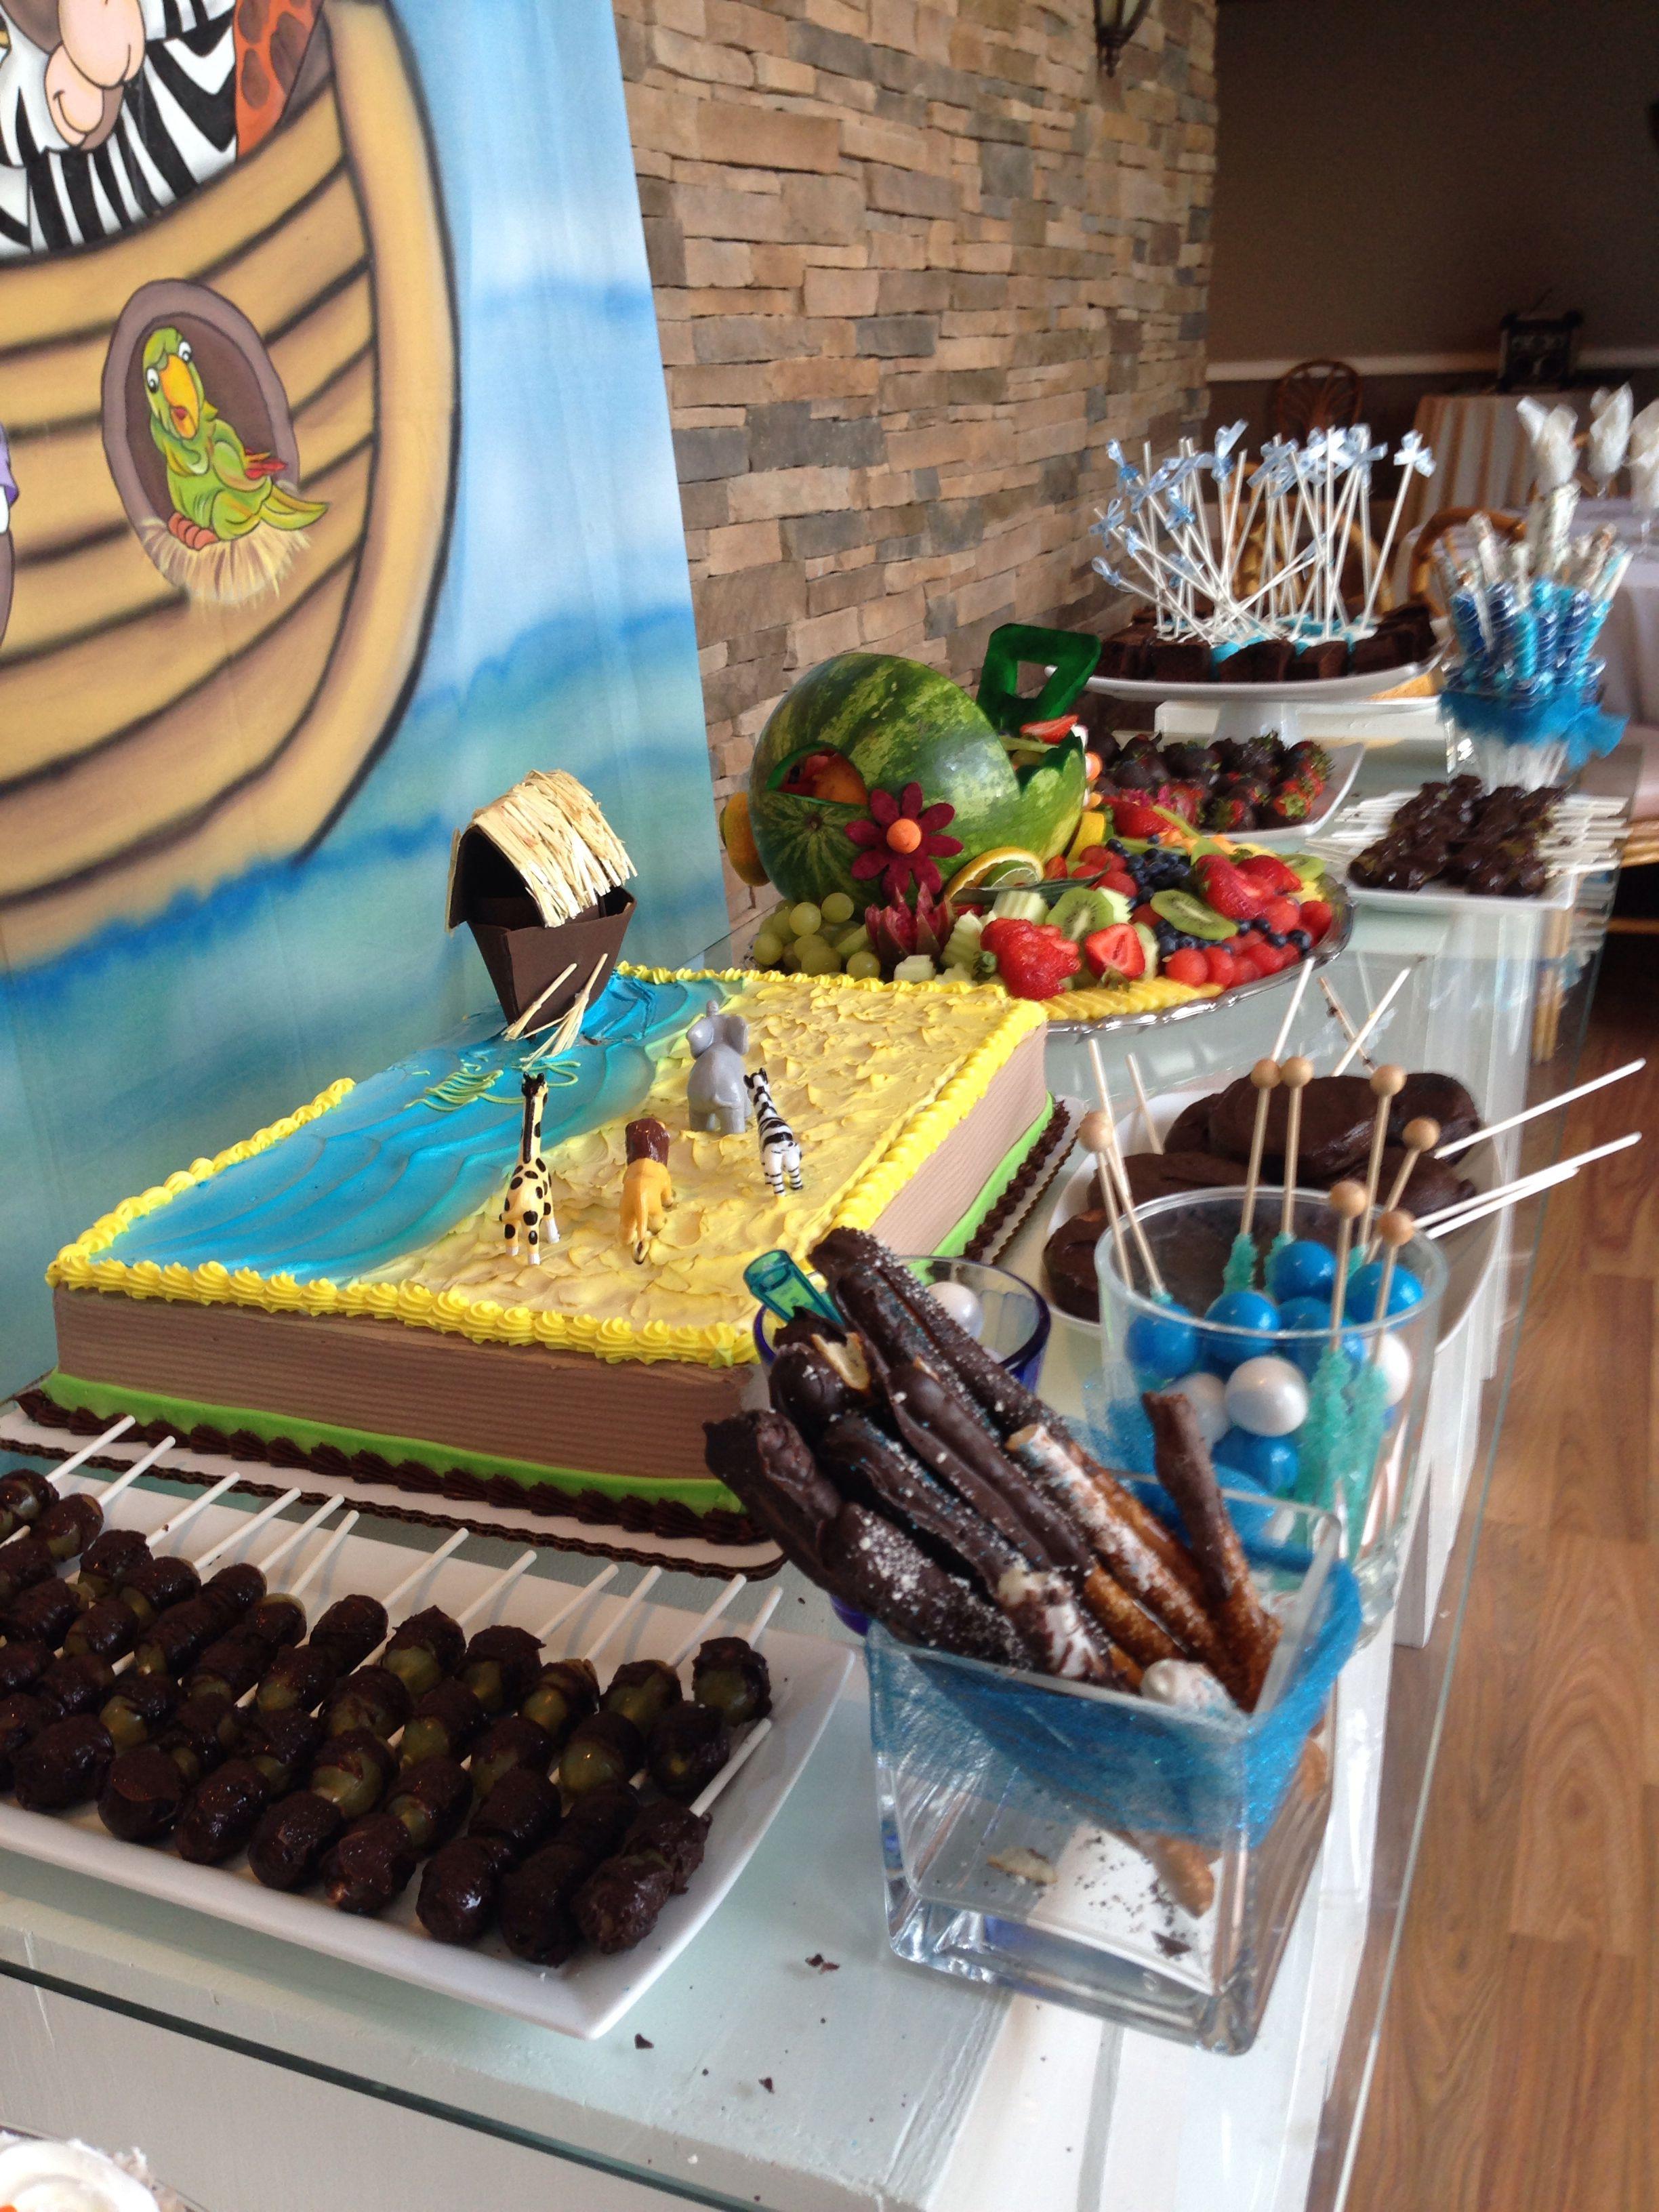 Cute and simple Noah's ark cake